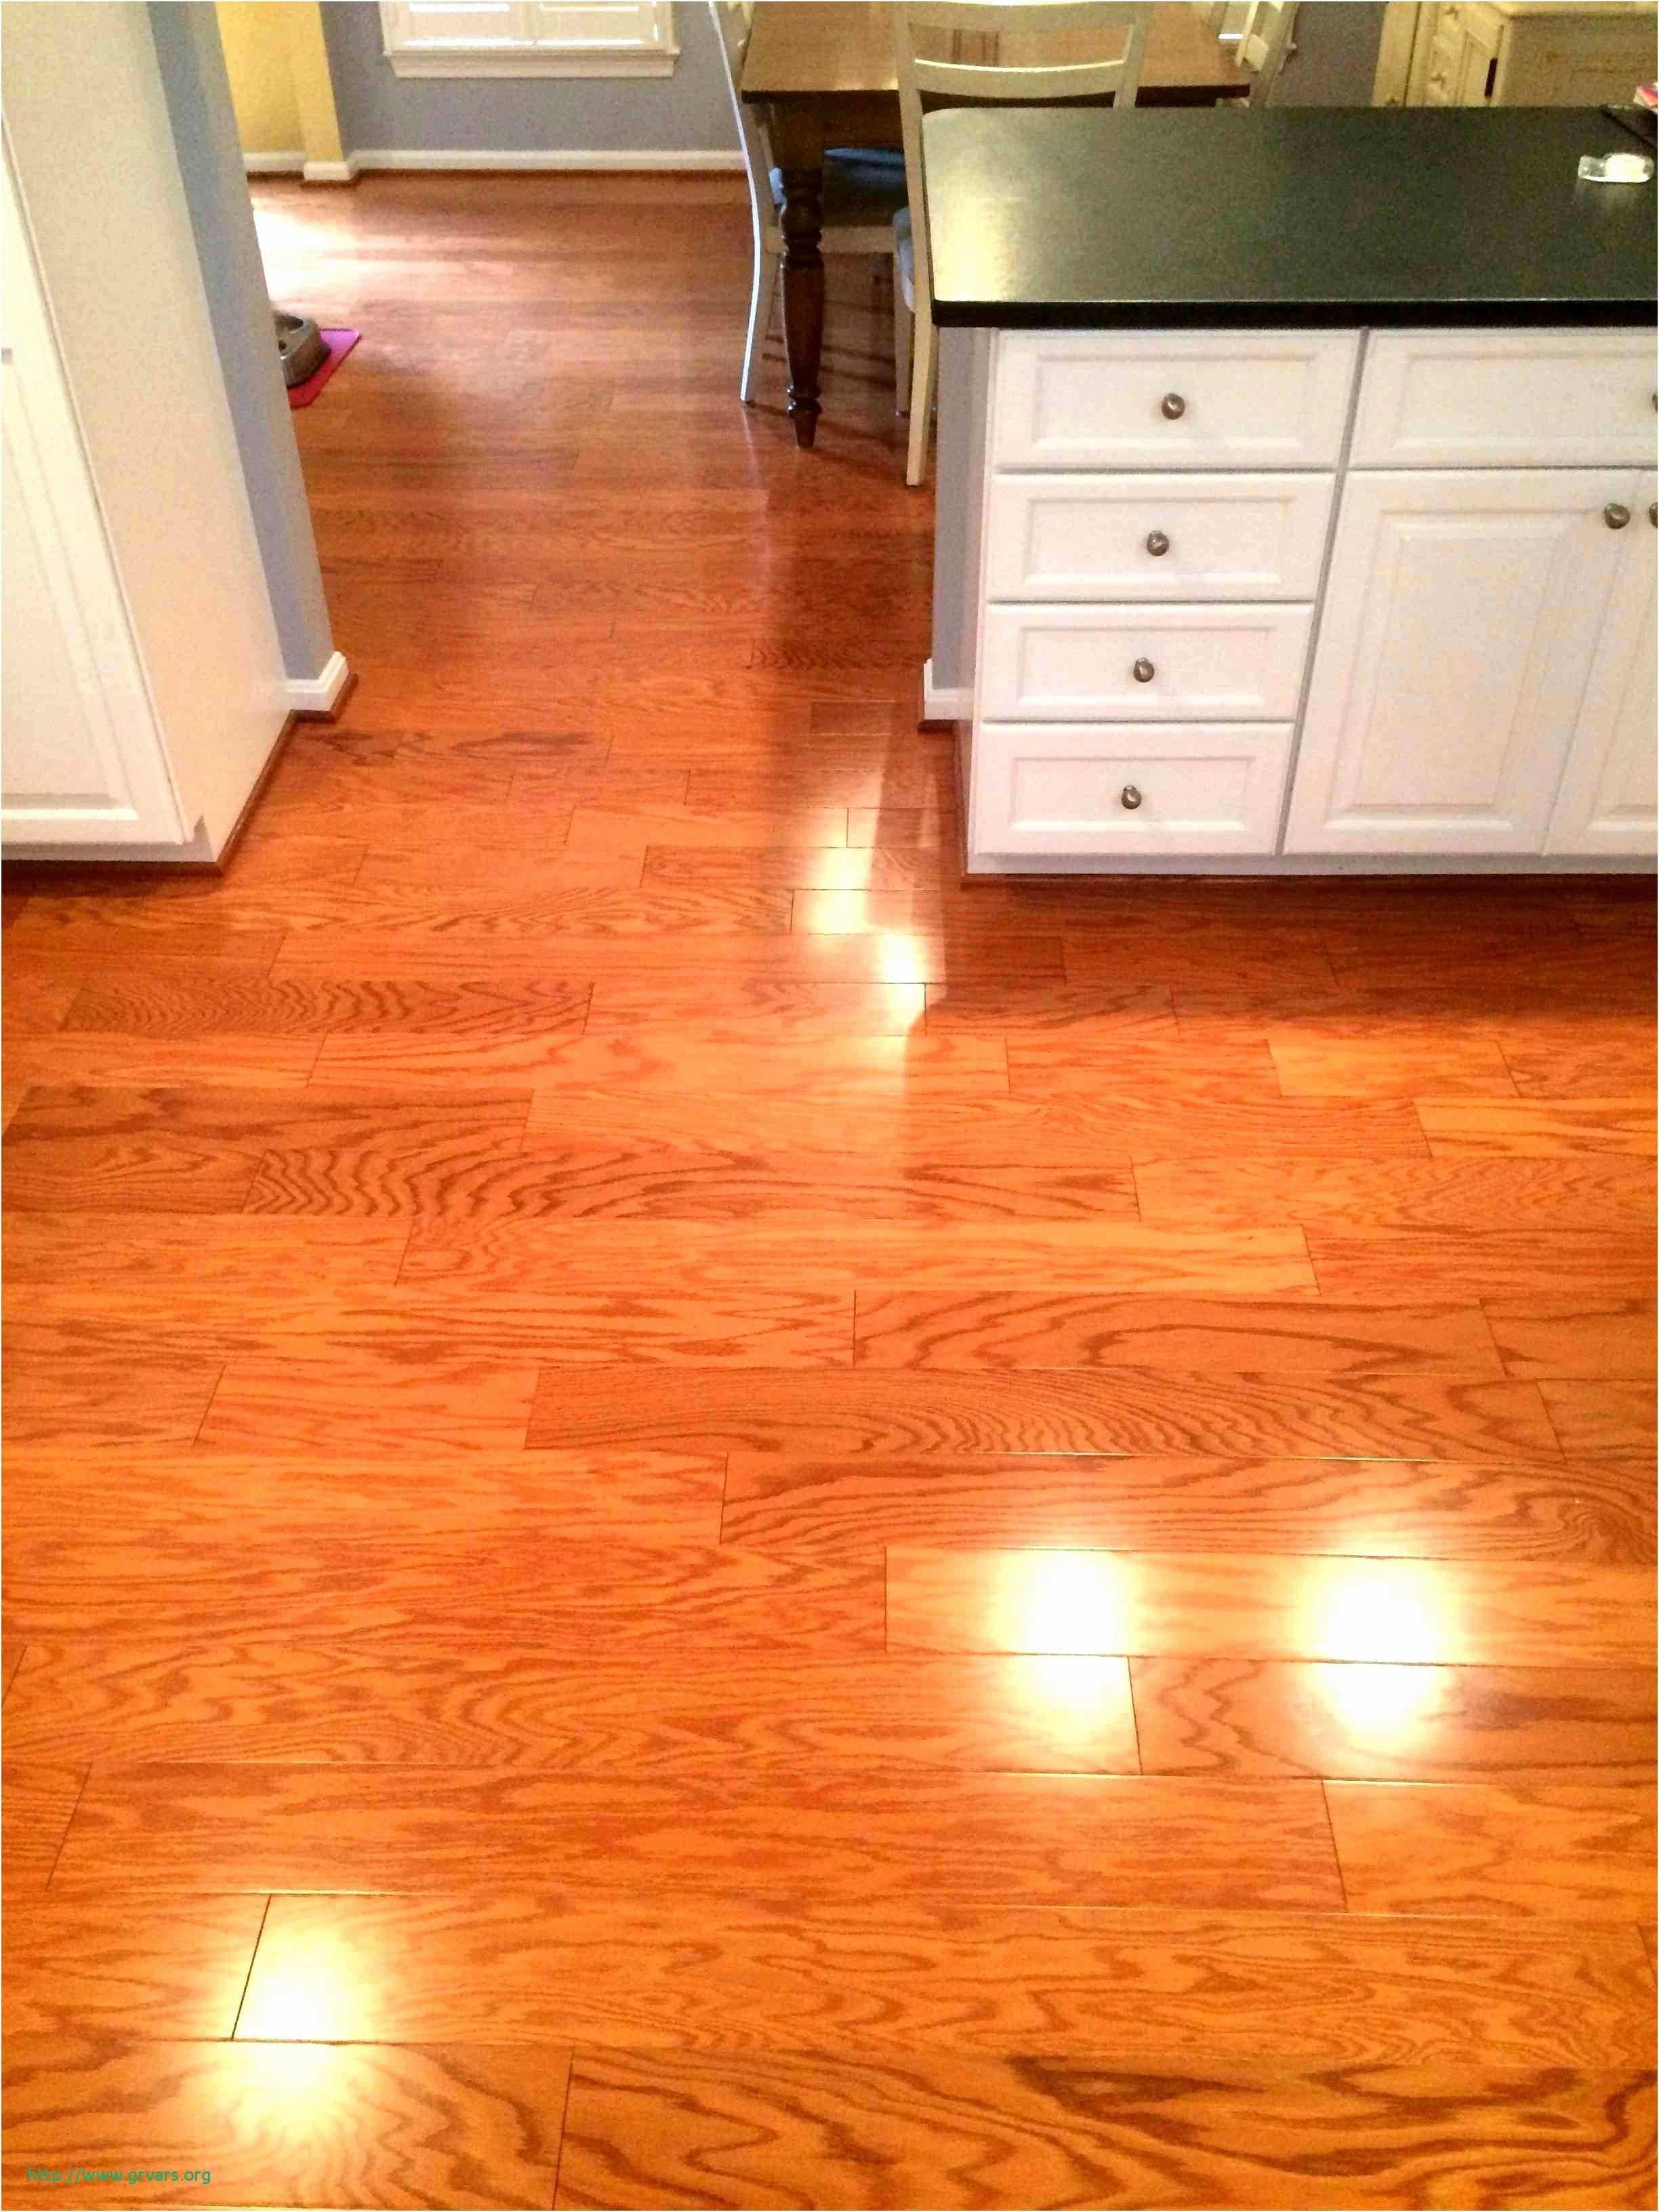 hl hardwood floors of 25 inspirant protective coating for hardwood floors ideas blog throughout bruce flooring best where to hardwood flooring inspirational 0d grace place barnegat